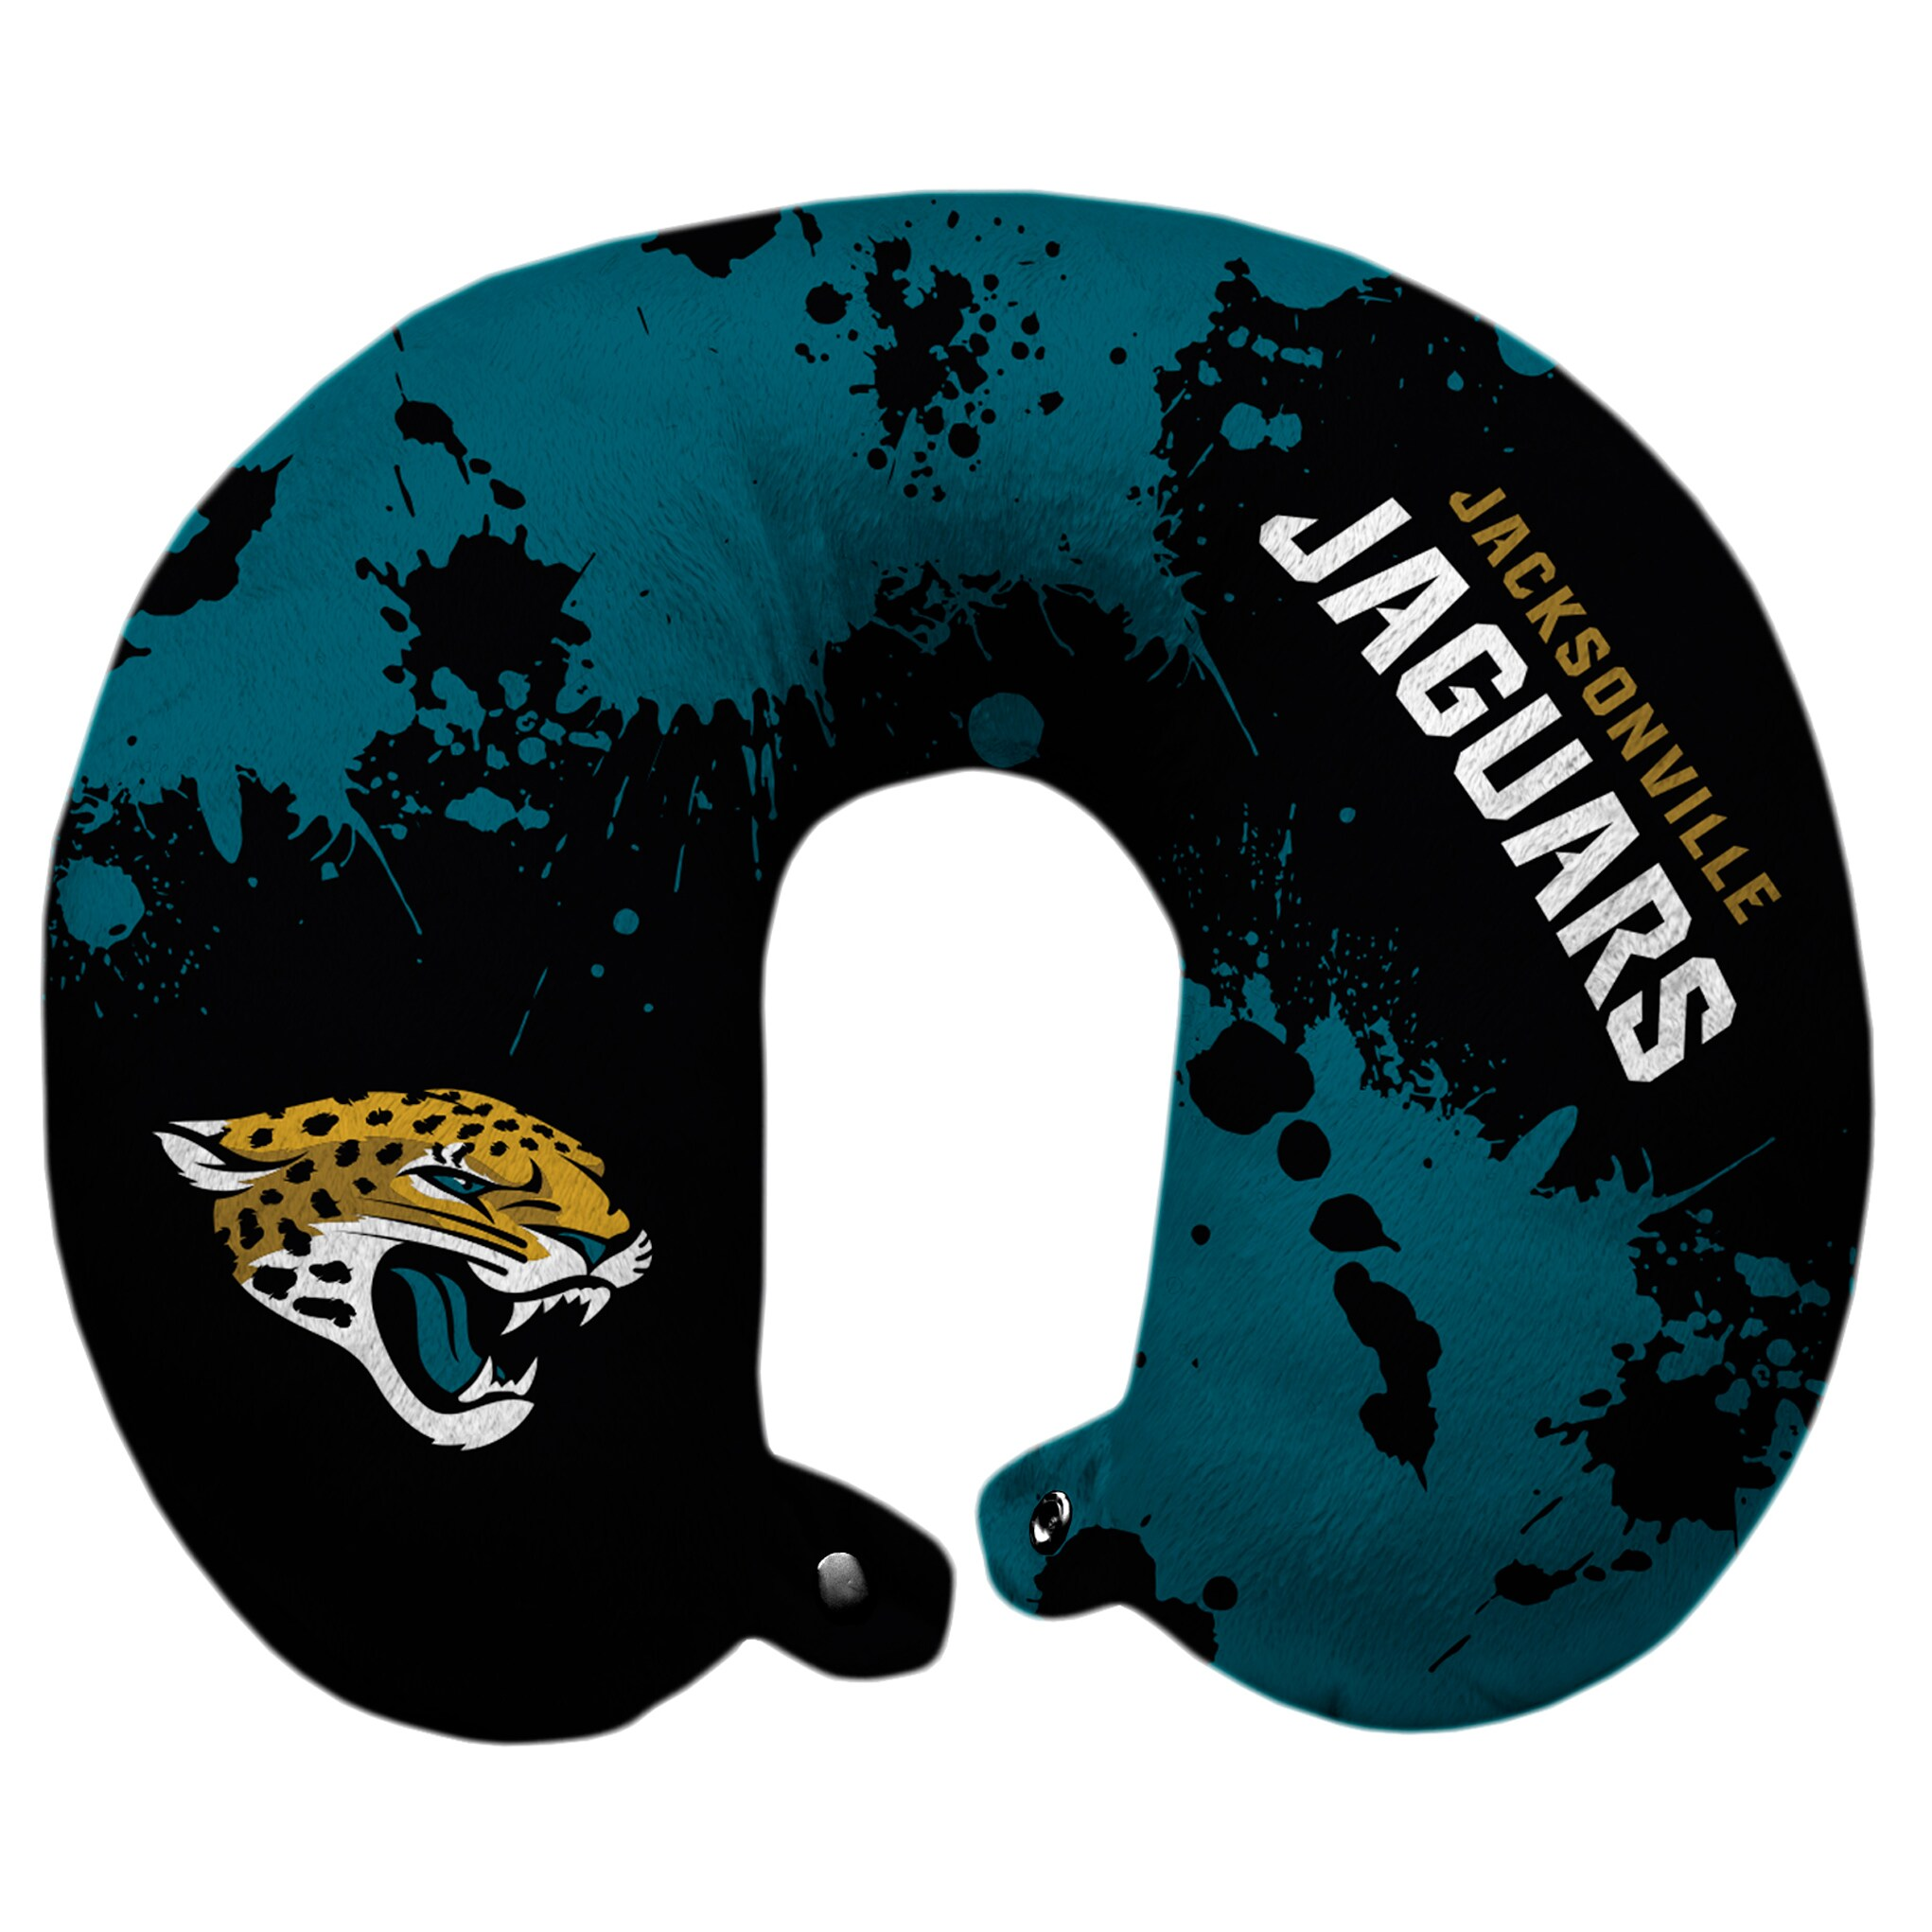 Jacksonville Jaguars Splatter Polyester Snap Closure Travel Pillow - Green